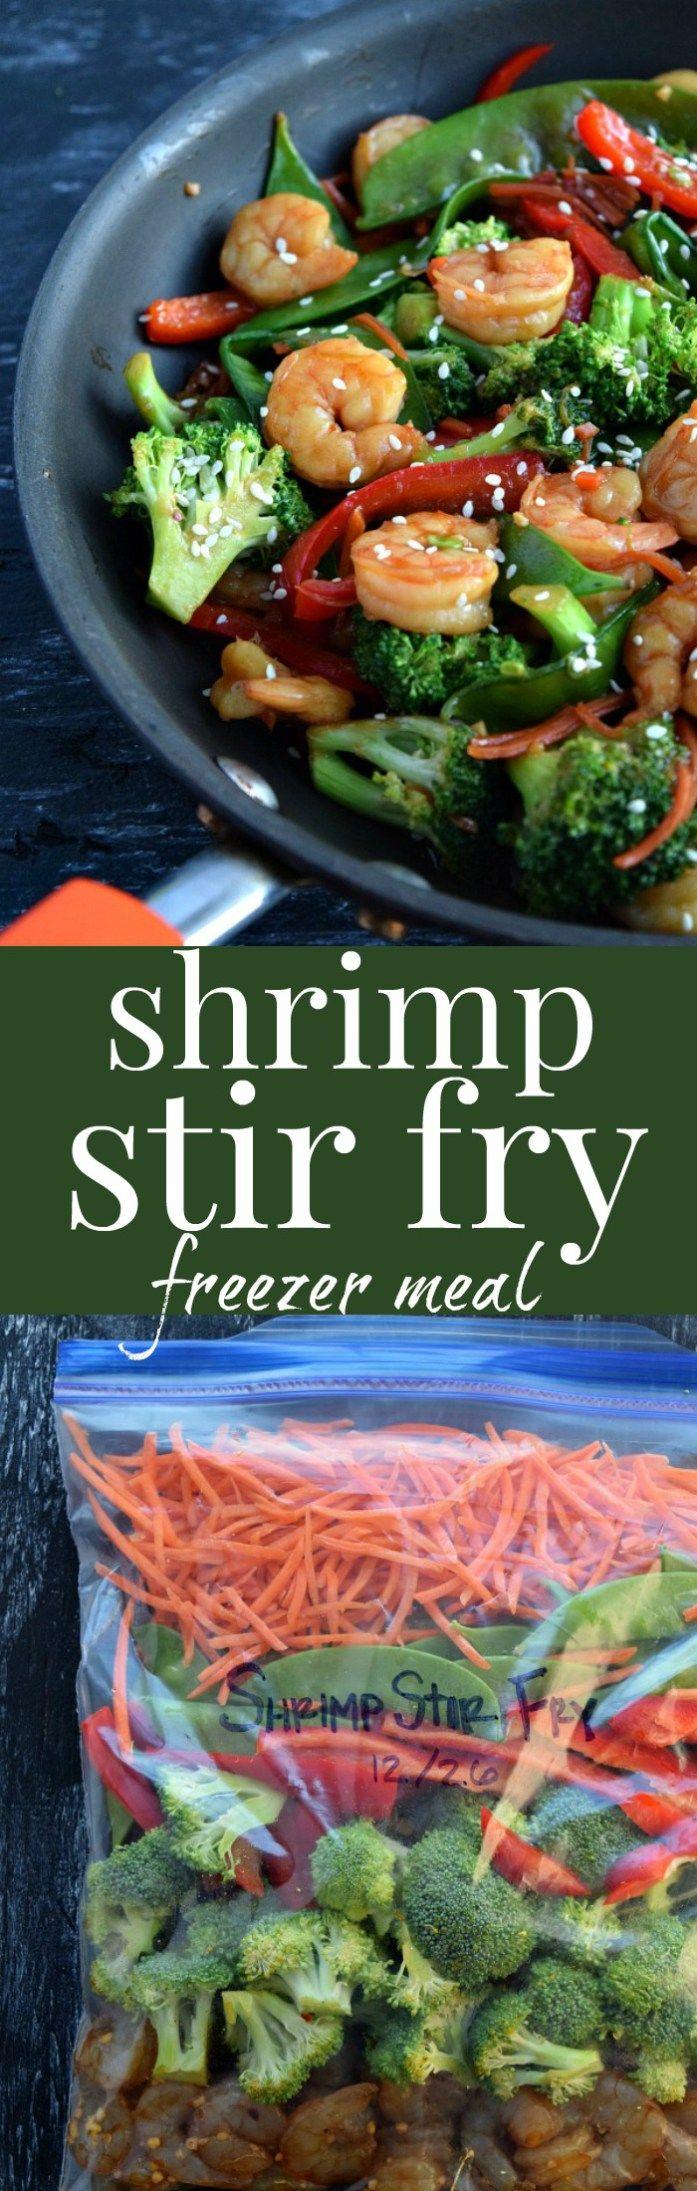 Shrimp Stir Fry Freezer Meal Pinterest Pin #freezermeal #stirfry #dinnerideas